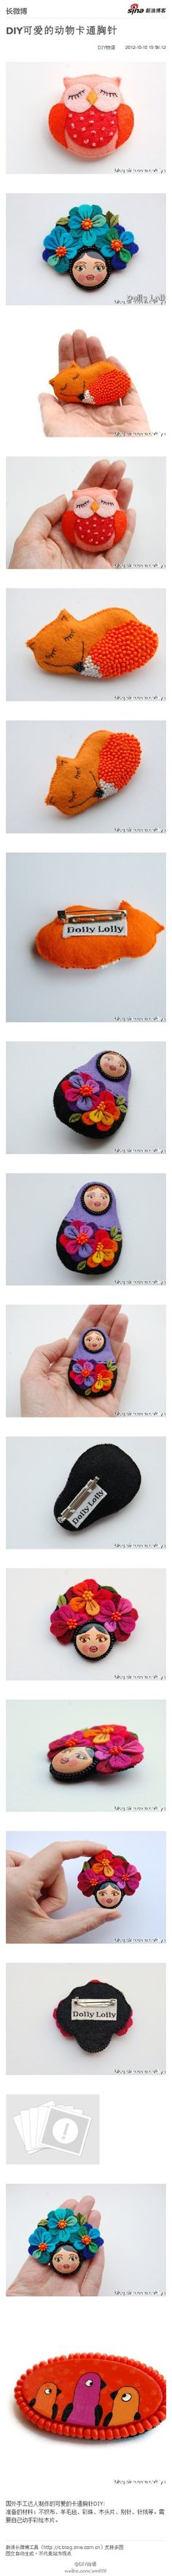 Adorable felt pins ... including owl, matyroshka, flowers ... 可爱的不织布。。…_来自雏菊的图片分享-堆糖网